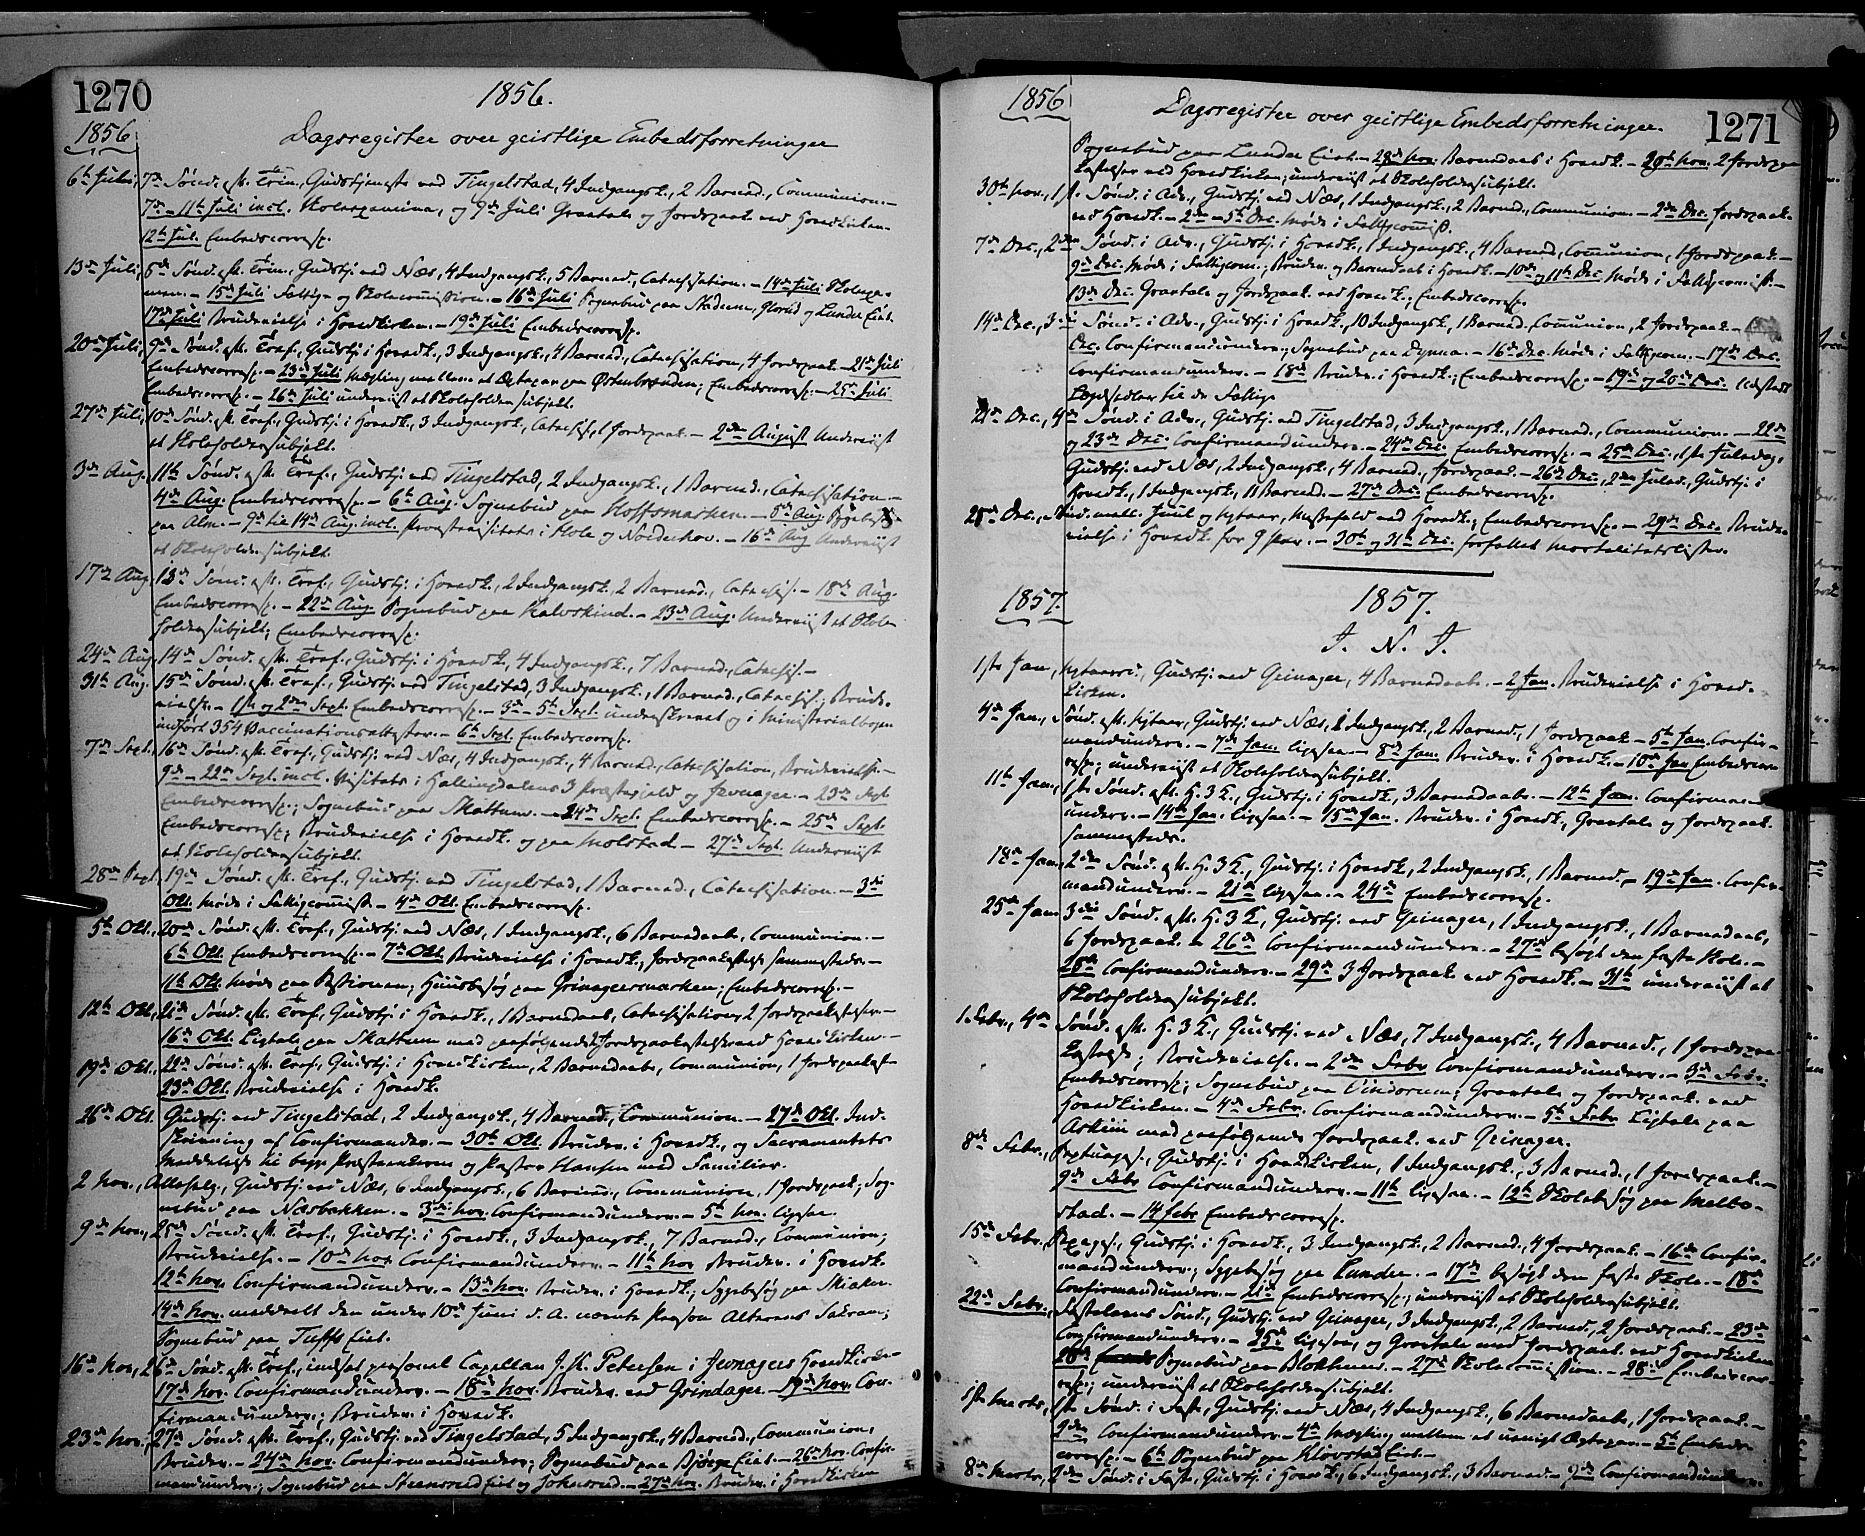 SAH, Gran prestekontor, Ministerialbok nr. 12, 1856-1874, s. 1270-1271